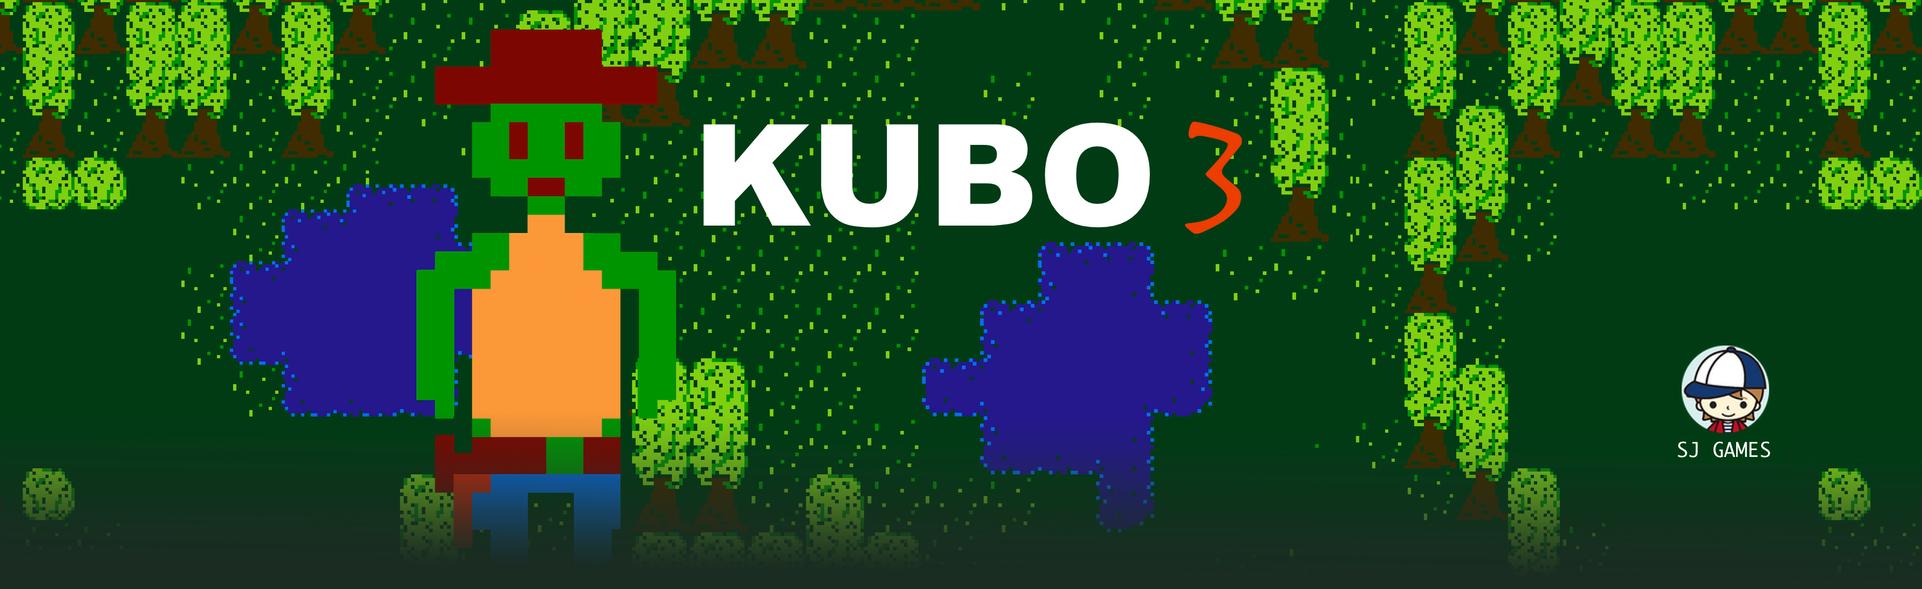 KUBO 3 (SJ Games - NES / FAMICOM)